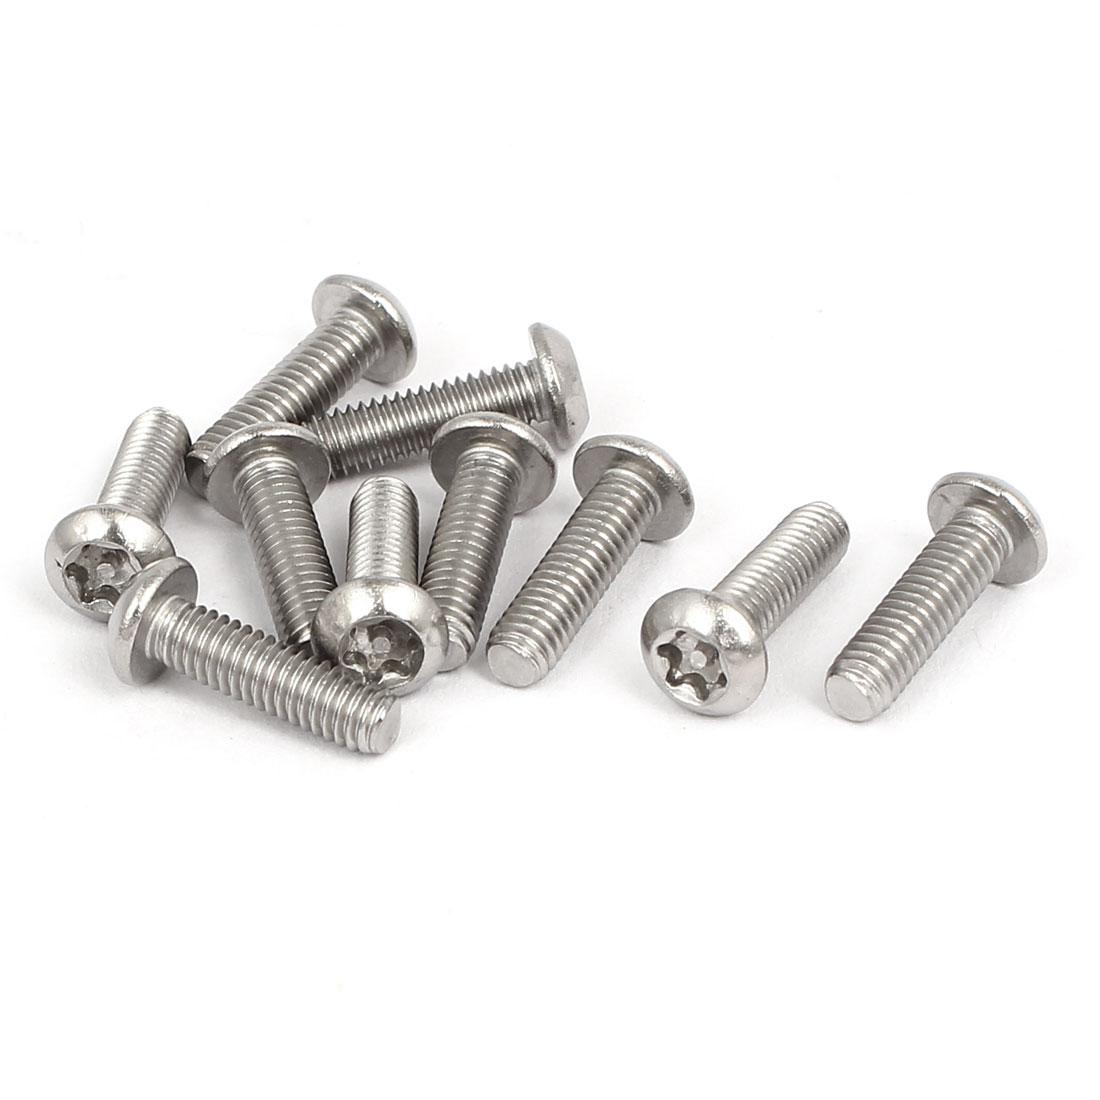 M4x14mm 304 Stainless Steel Button Head Torx Tamper Resistant Screws 10pcs